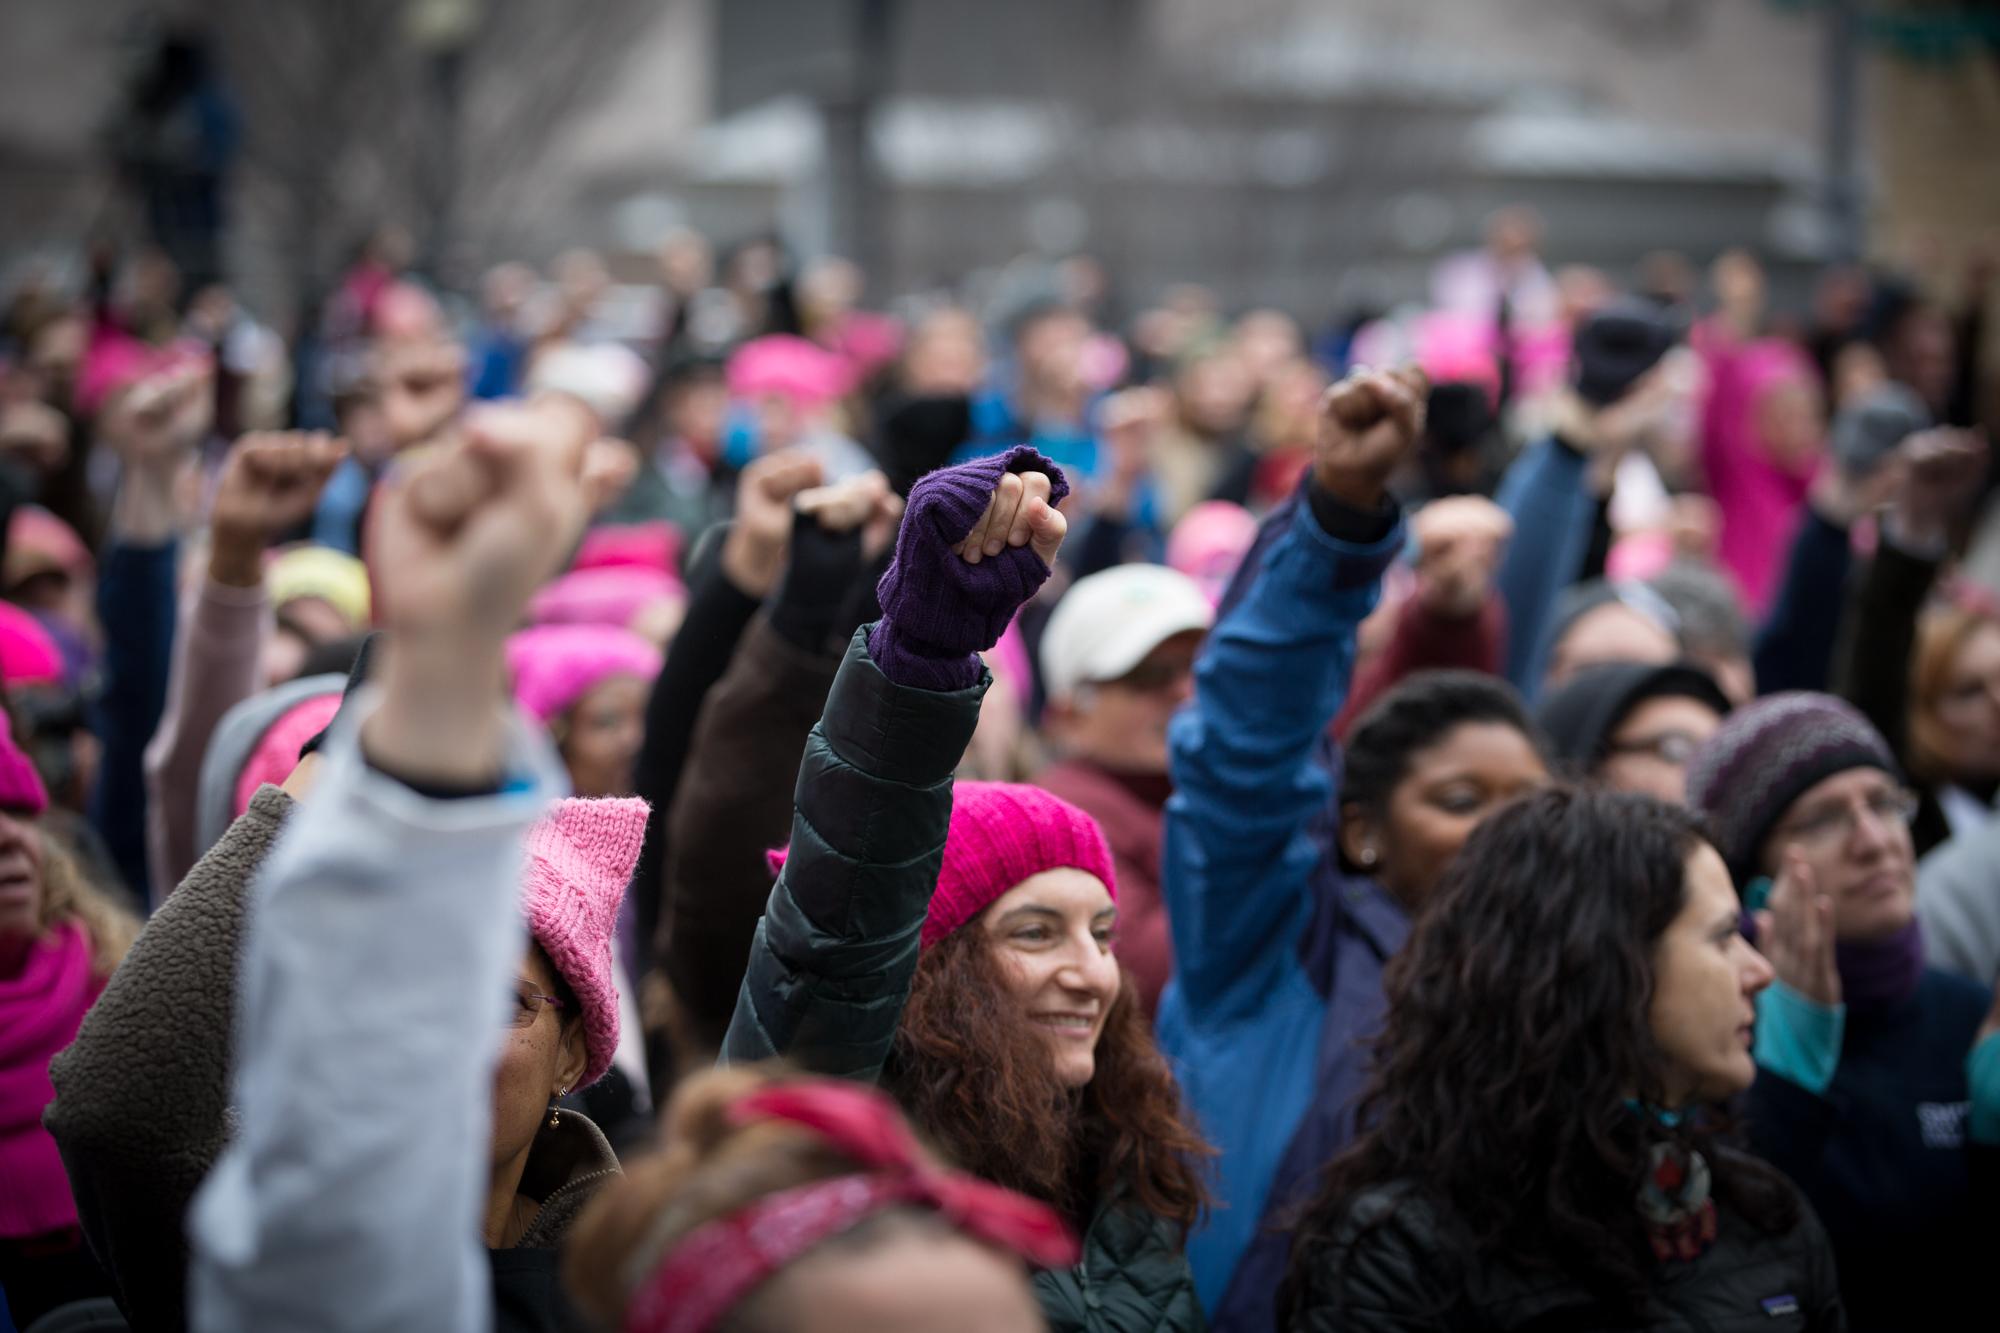 The Women's March on Washington, Jan. 21, 2017.Photo Credit: Alex Arbuckle